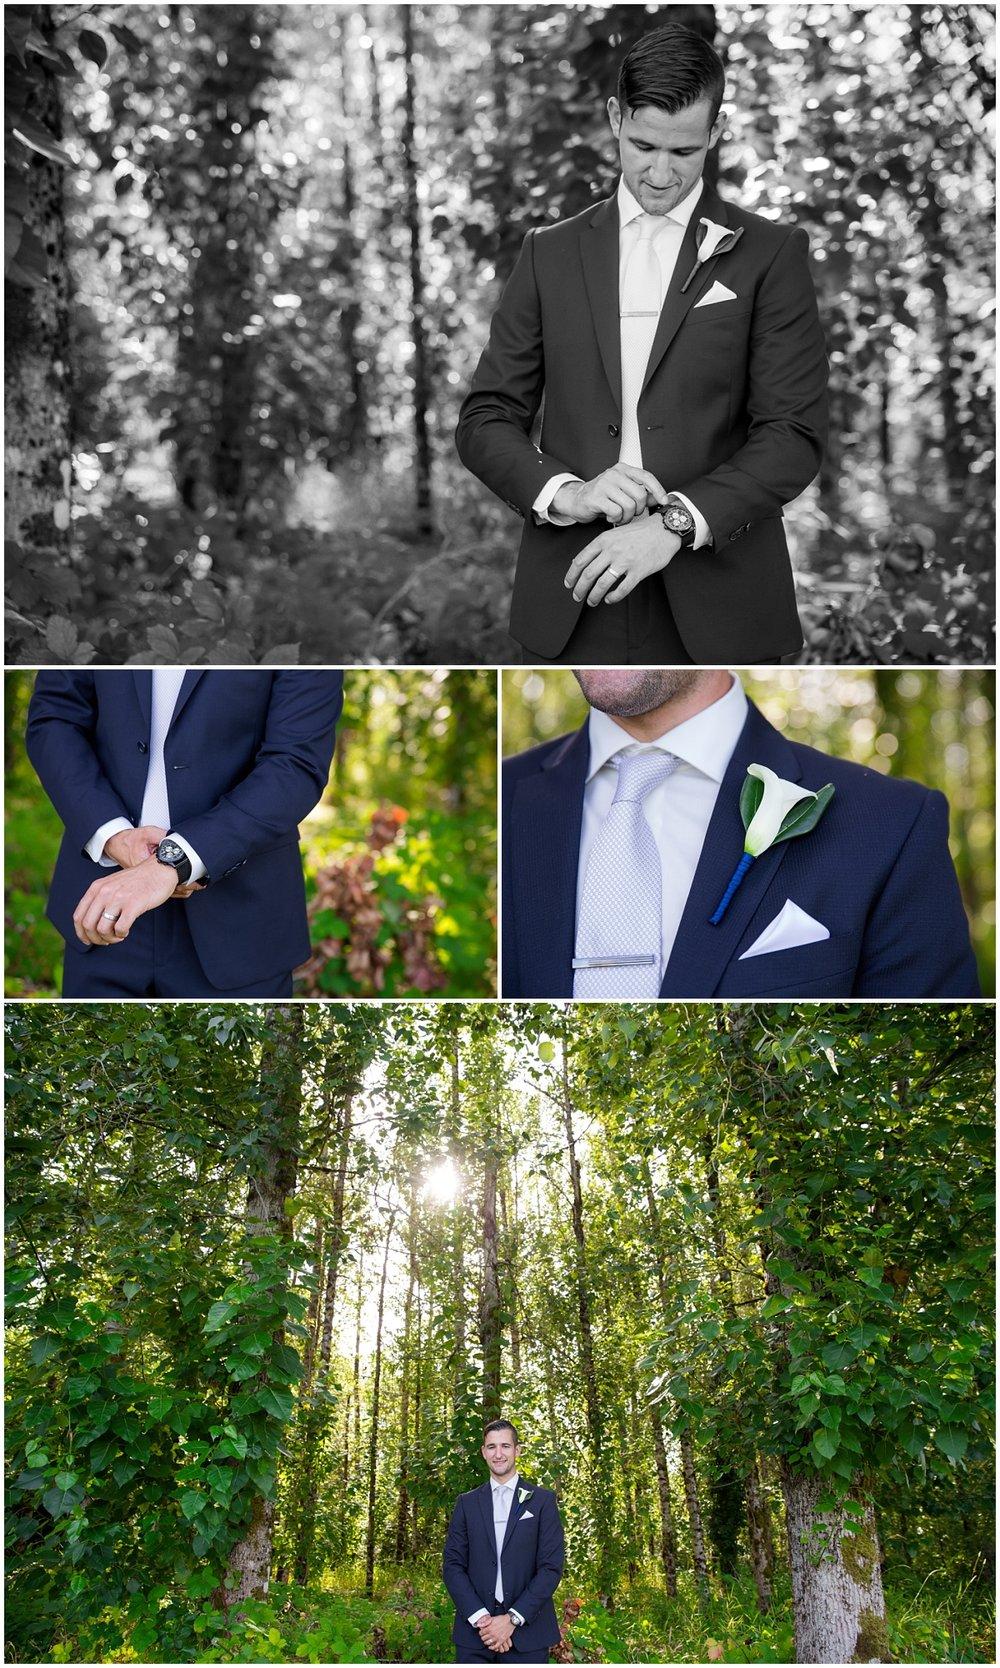 Amazing Day Photography - Redwoods Golf Course Wedding - Amanda and Dustin - Langley Wedding Photographer  (18).jpg